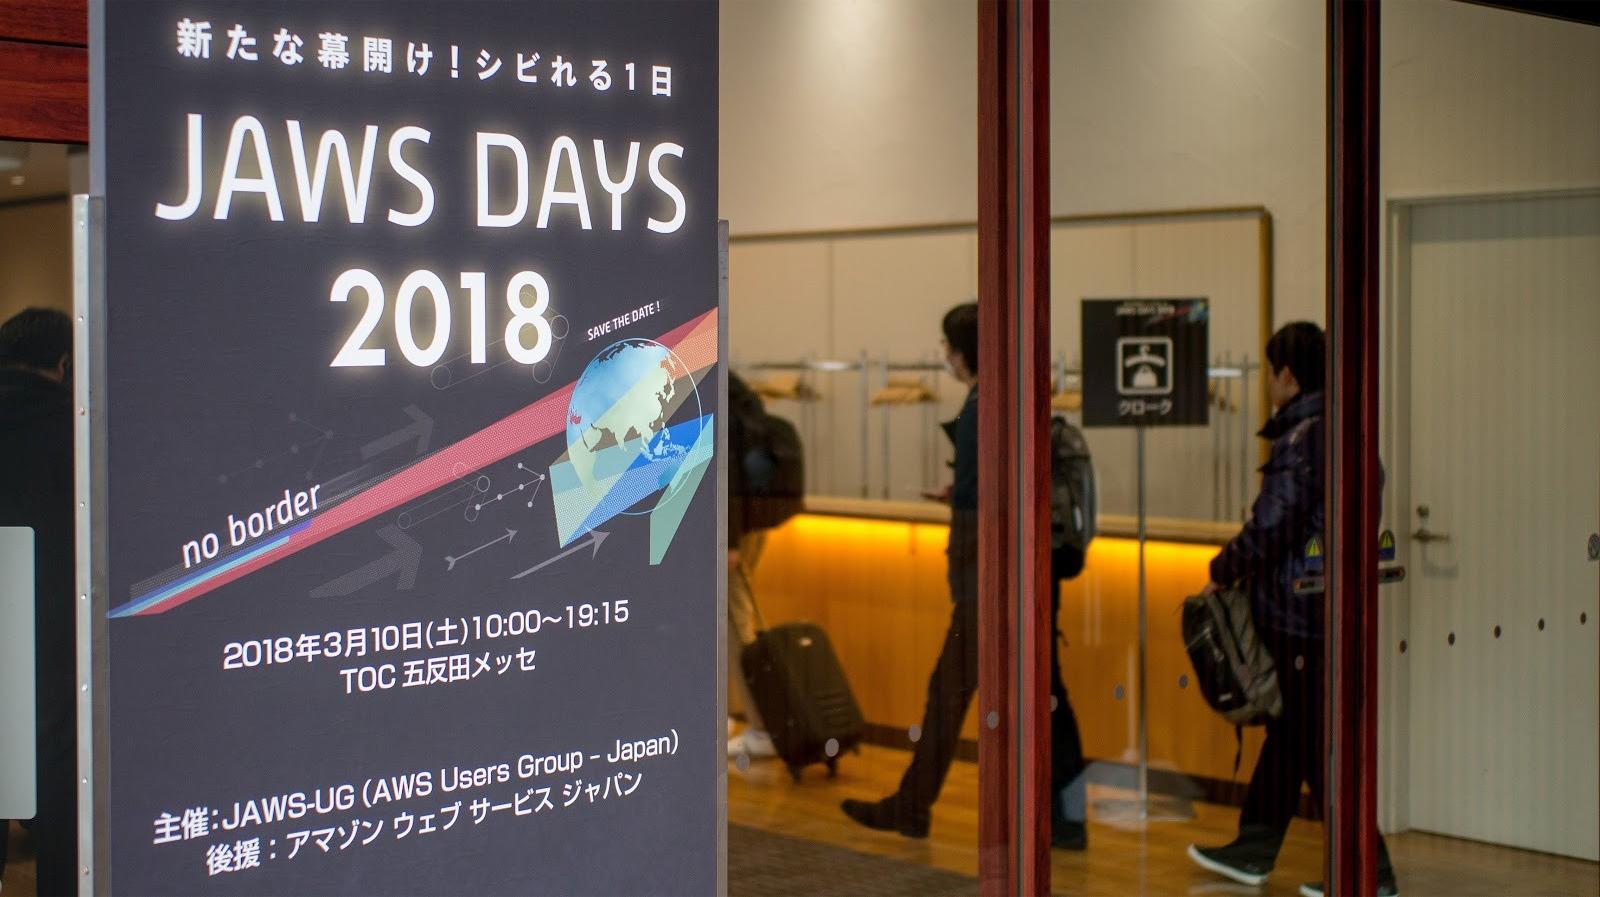 JAWS DAYS 2018